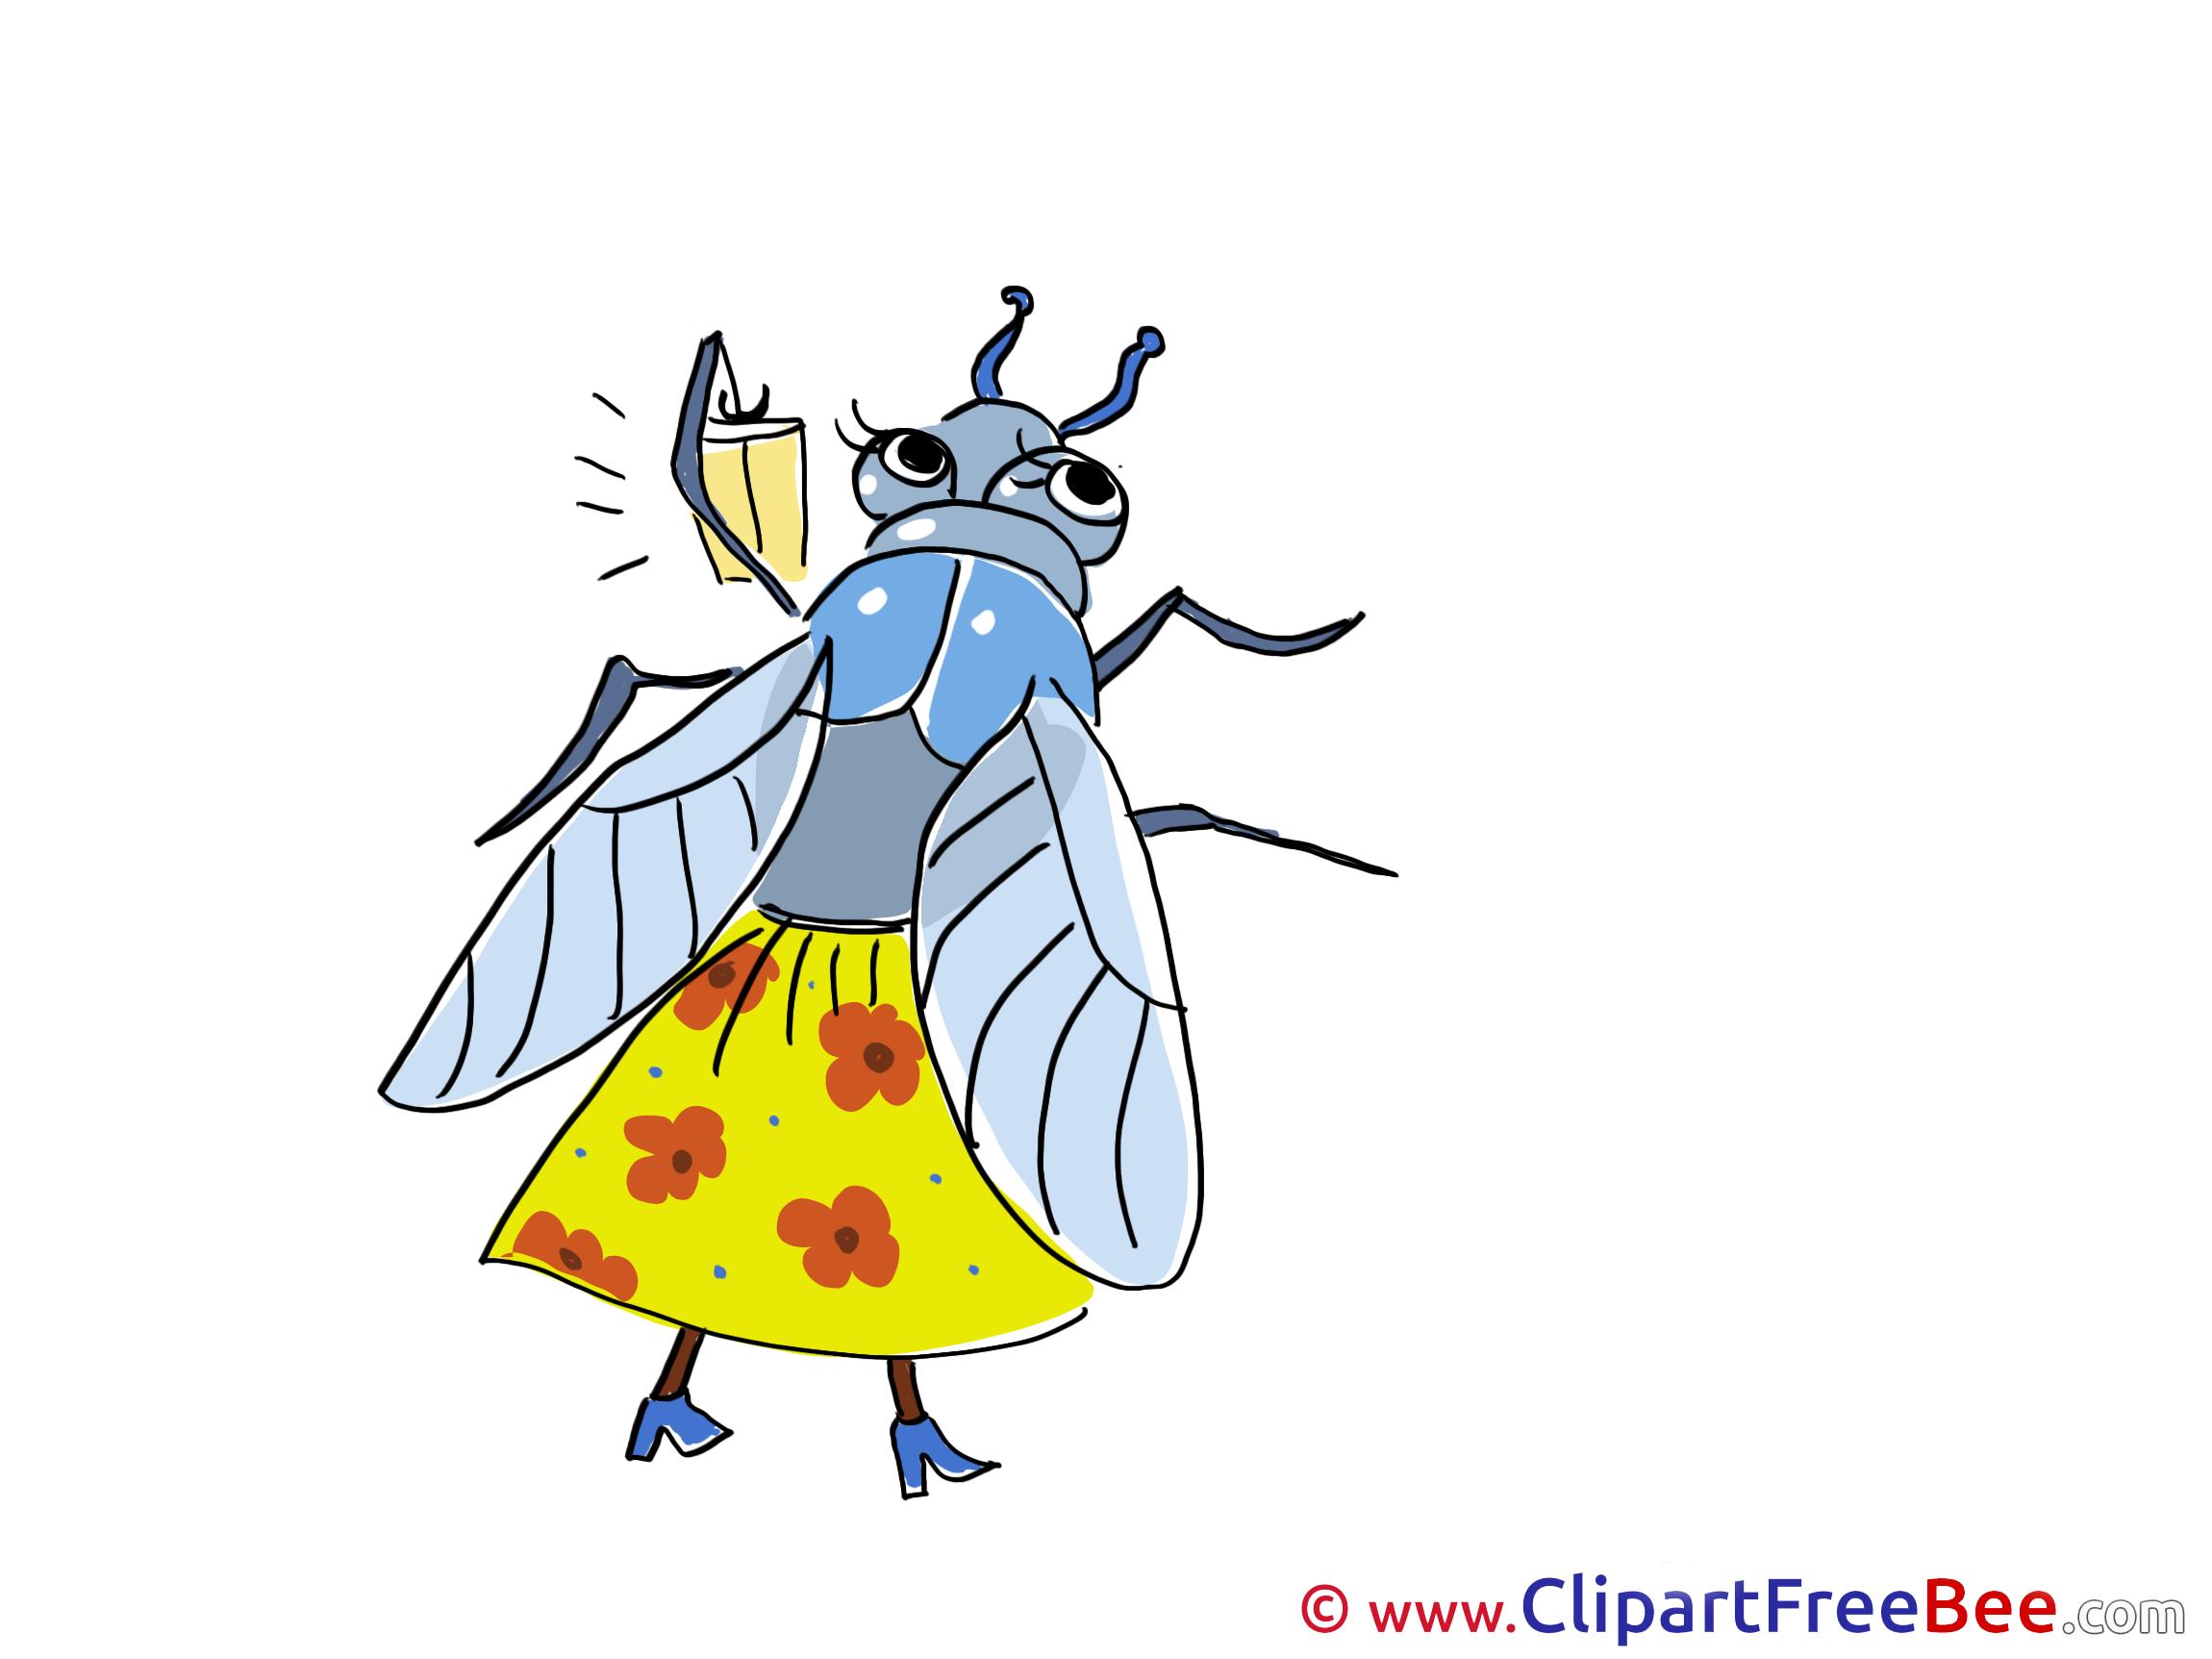 Fly free Illustration download